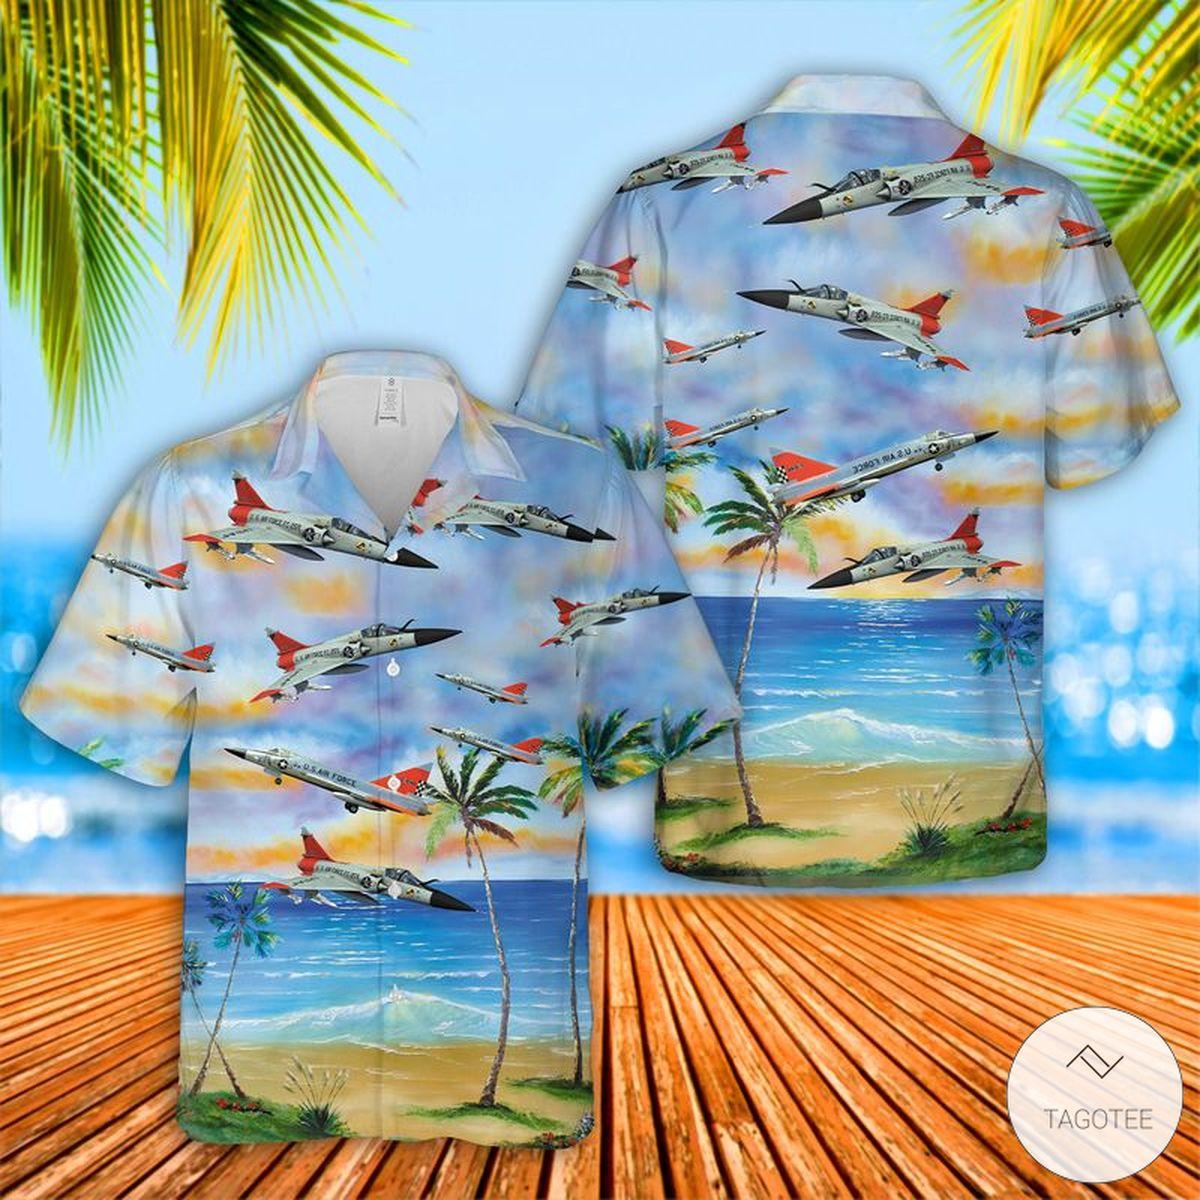 US-Air-Force-Convair-F-102-Delta-Dagger-Hawaiian-Shirt-Beach-Shorts